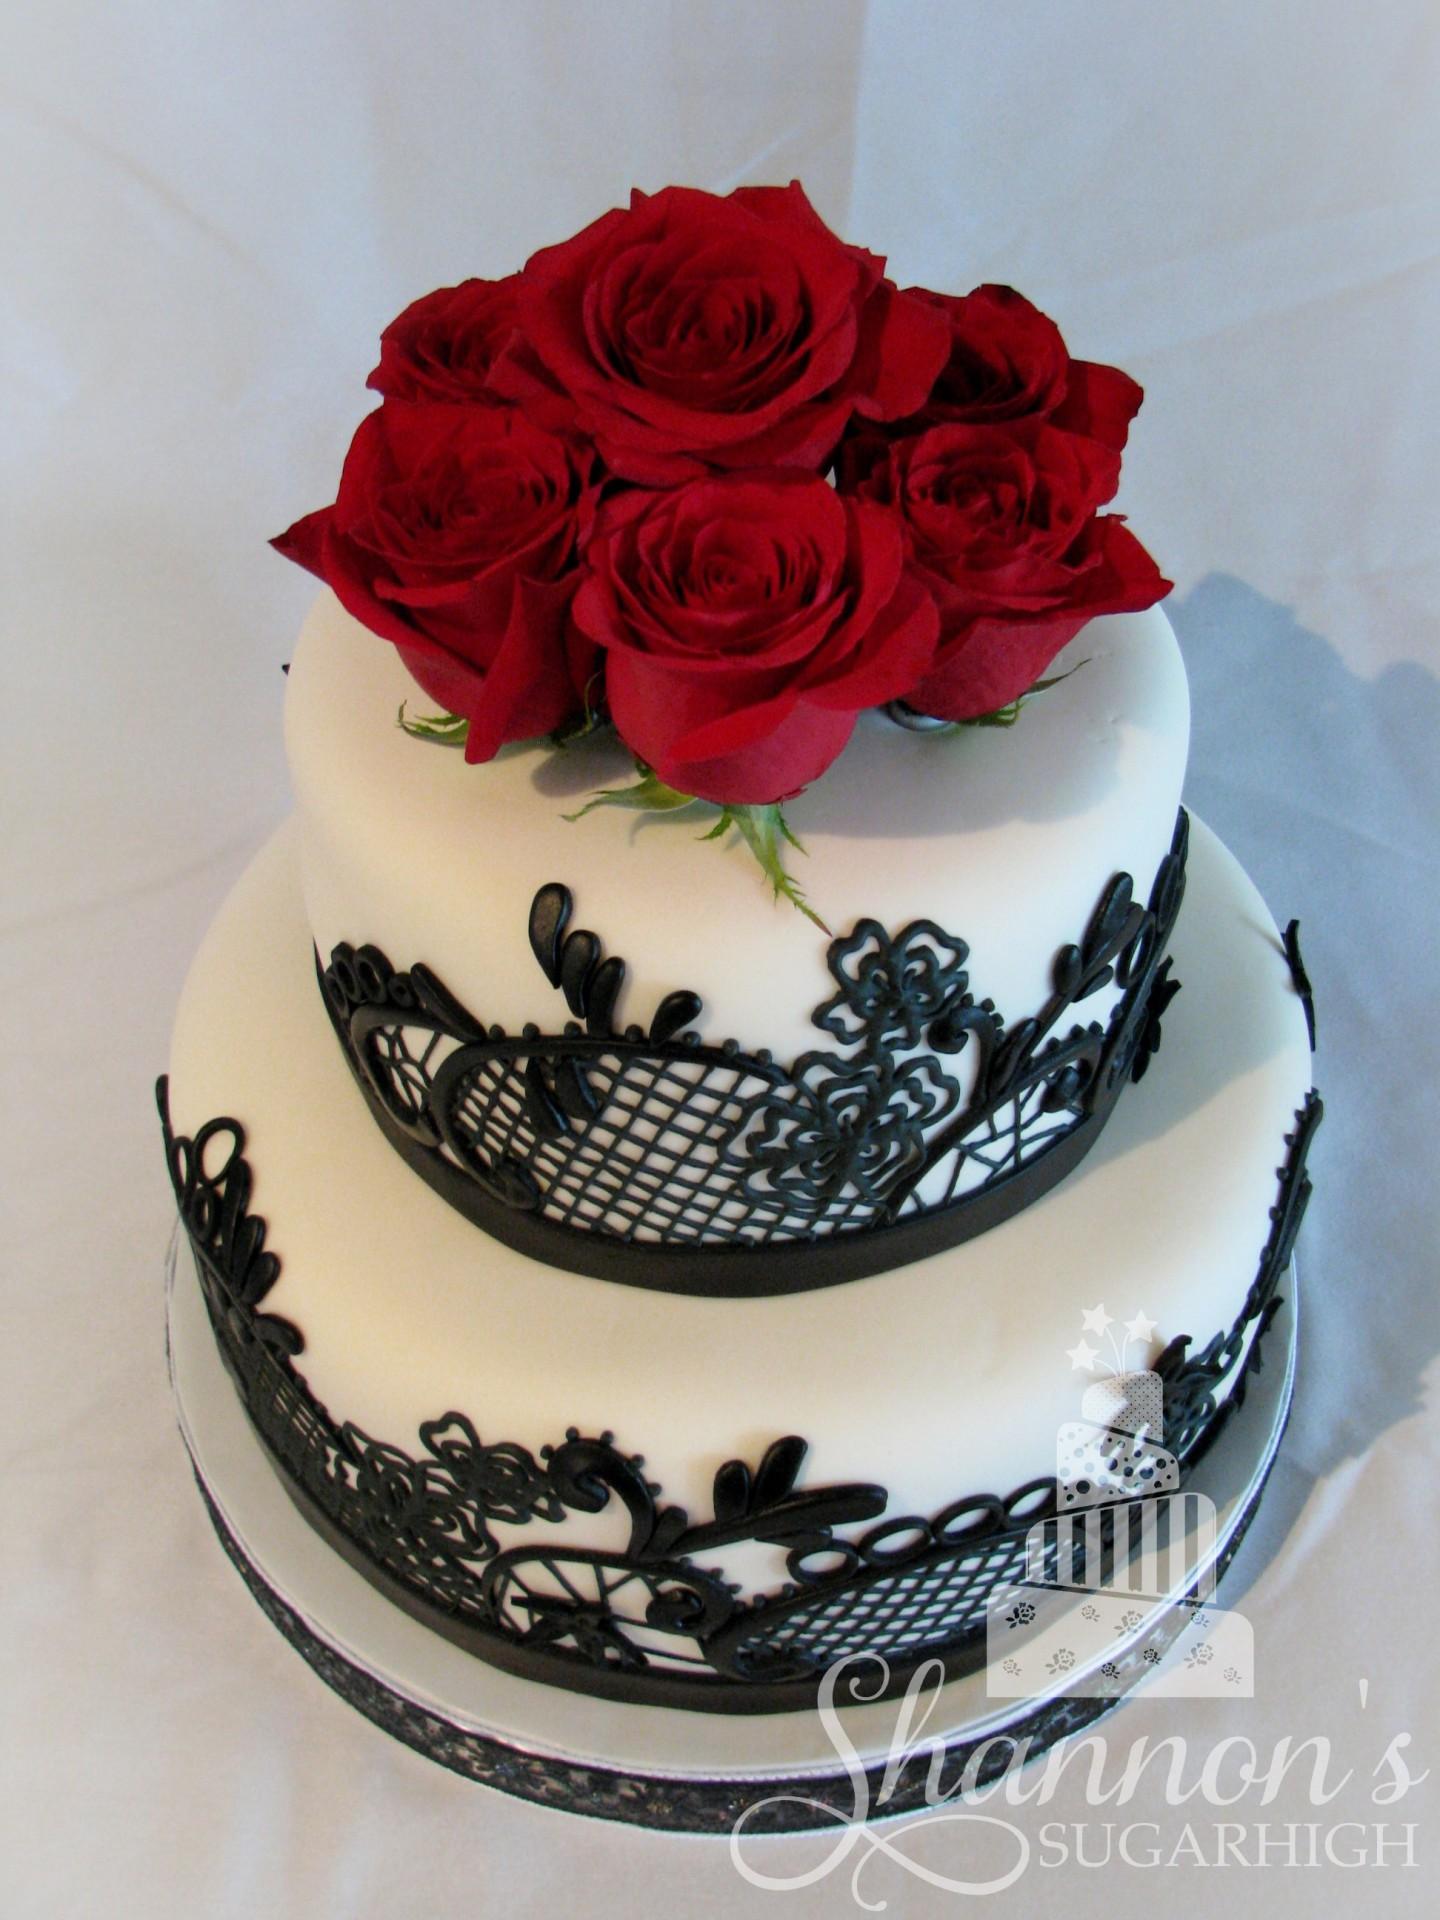 Wedding (Top View)